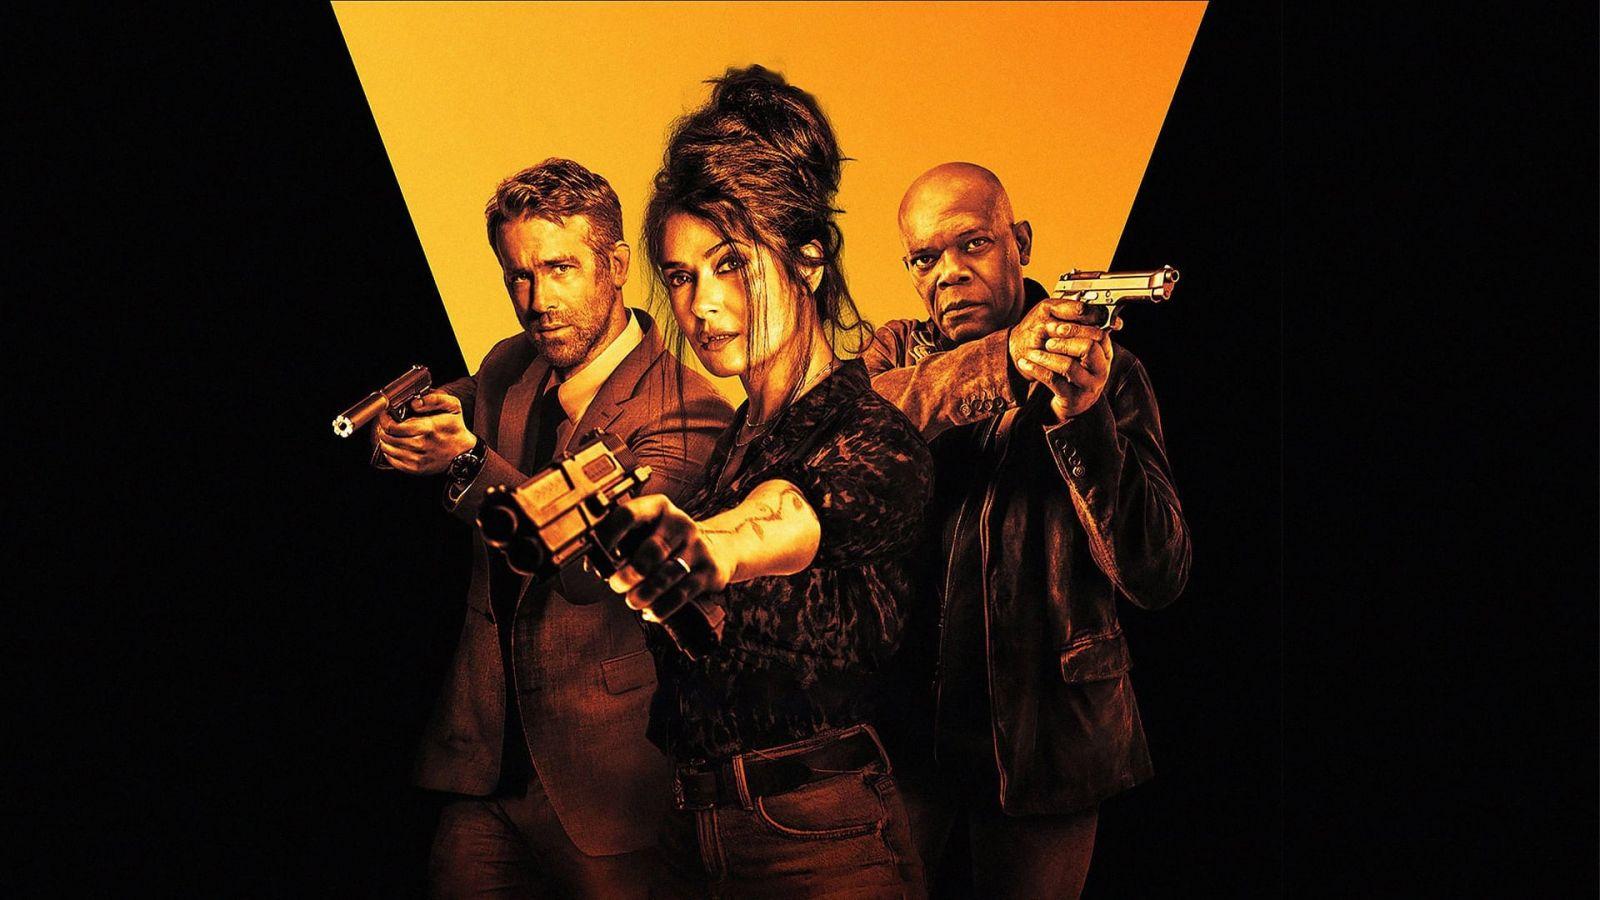 Hitman's Wife's Bodyguard (2021) Killer Threesome Full Movies